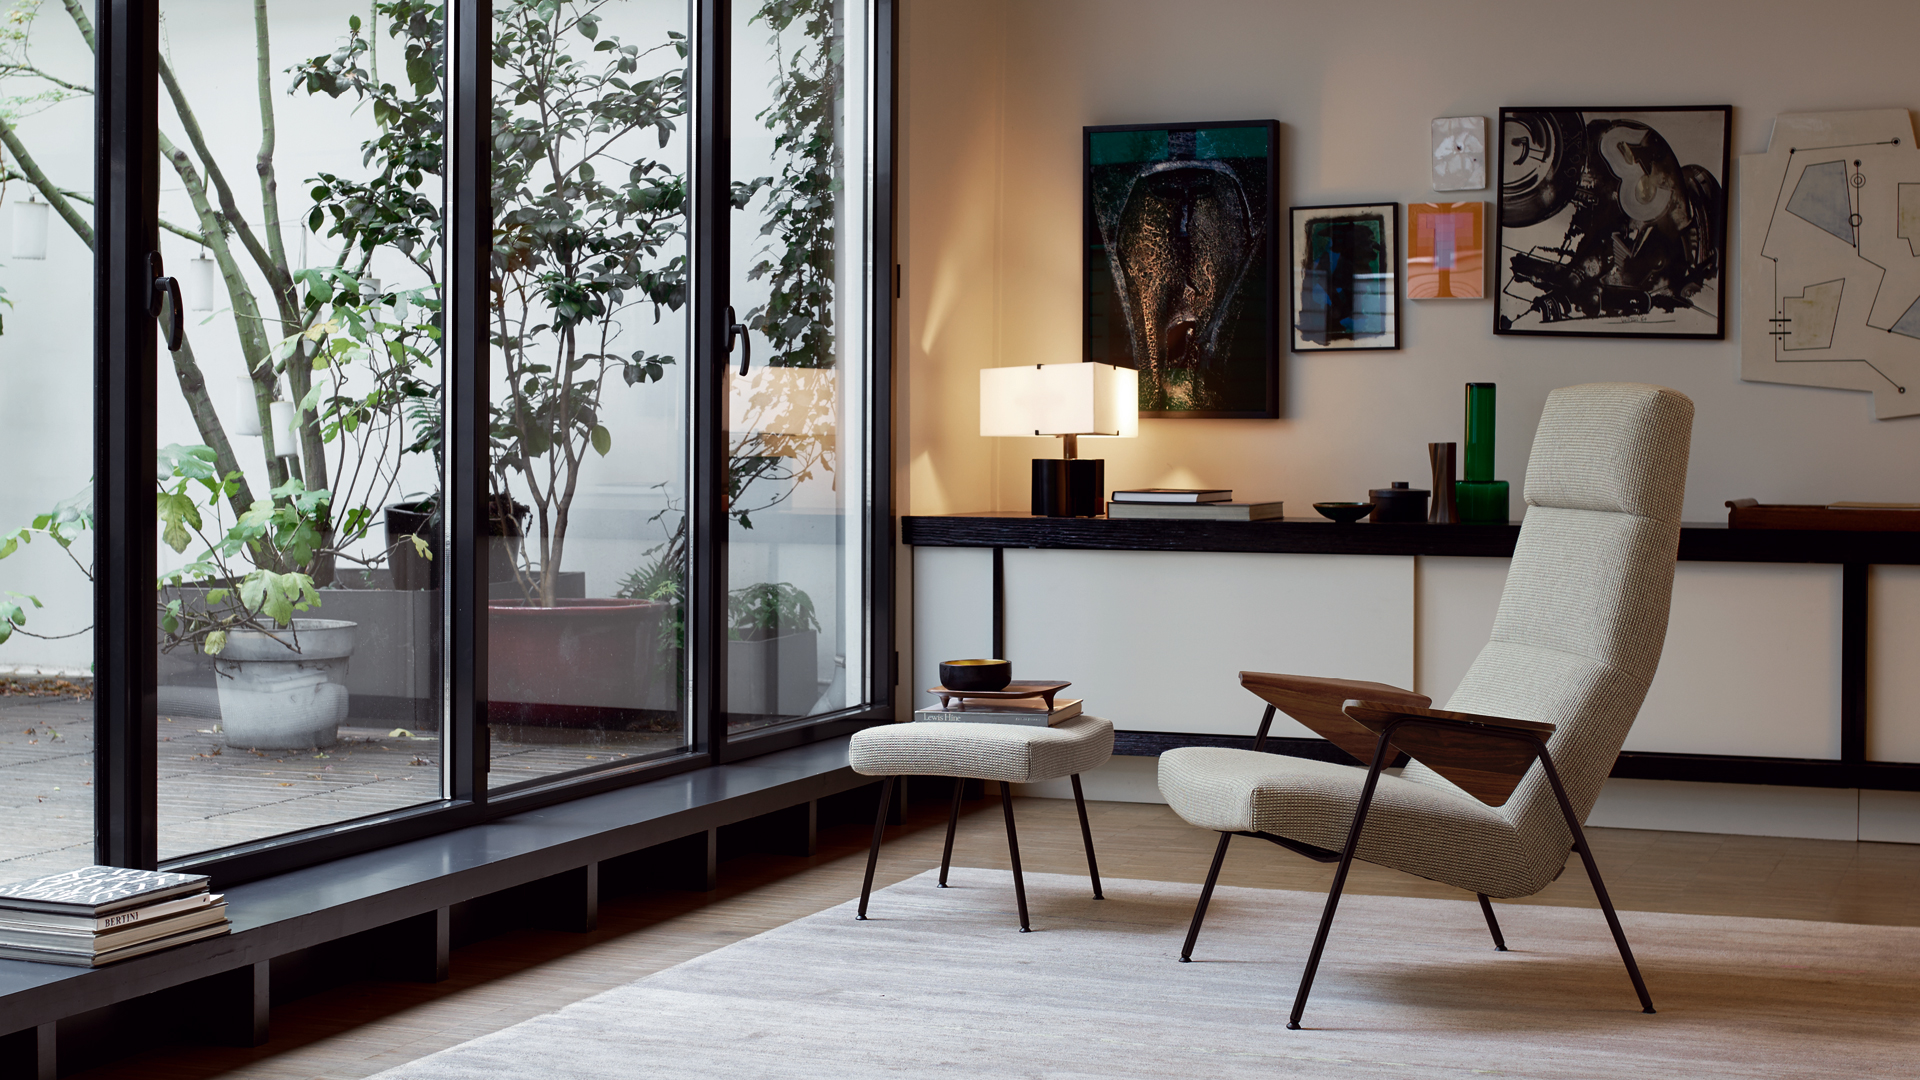 walter knoll sofas sessel st hle und tische bei prinz. Black Bedroom Furniture Sets. Home Design Ideas